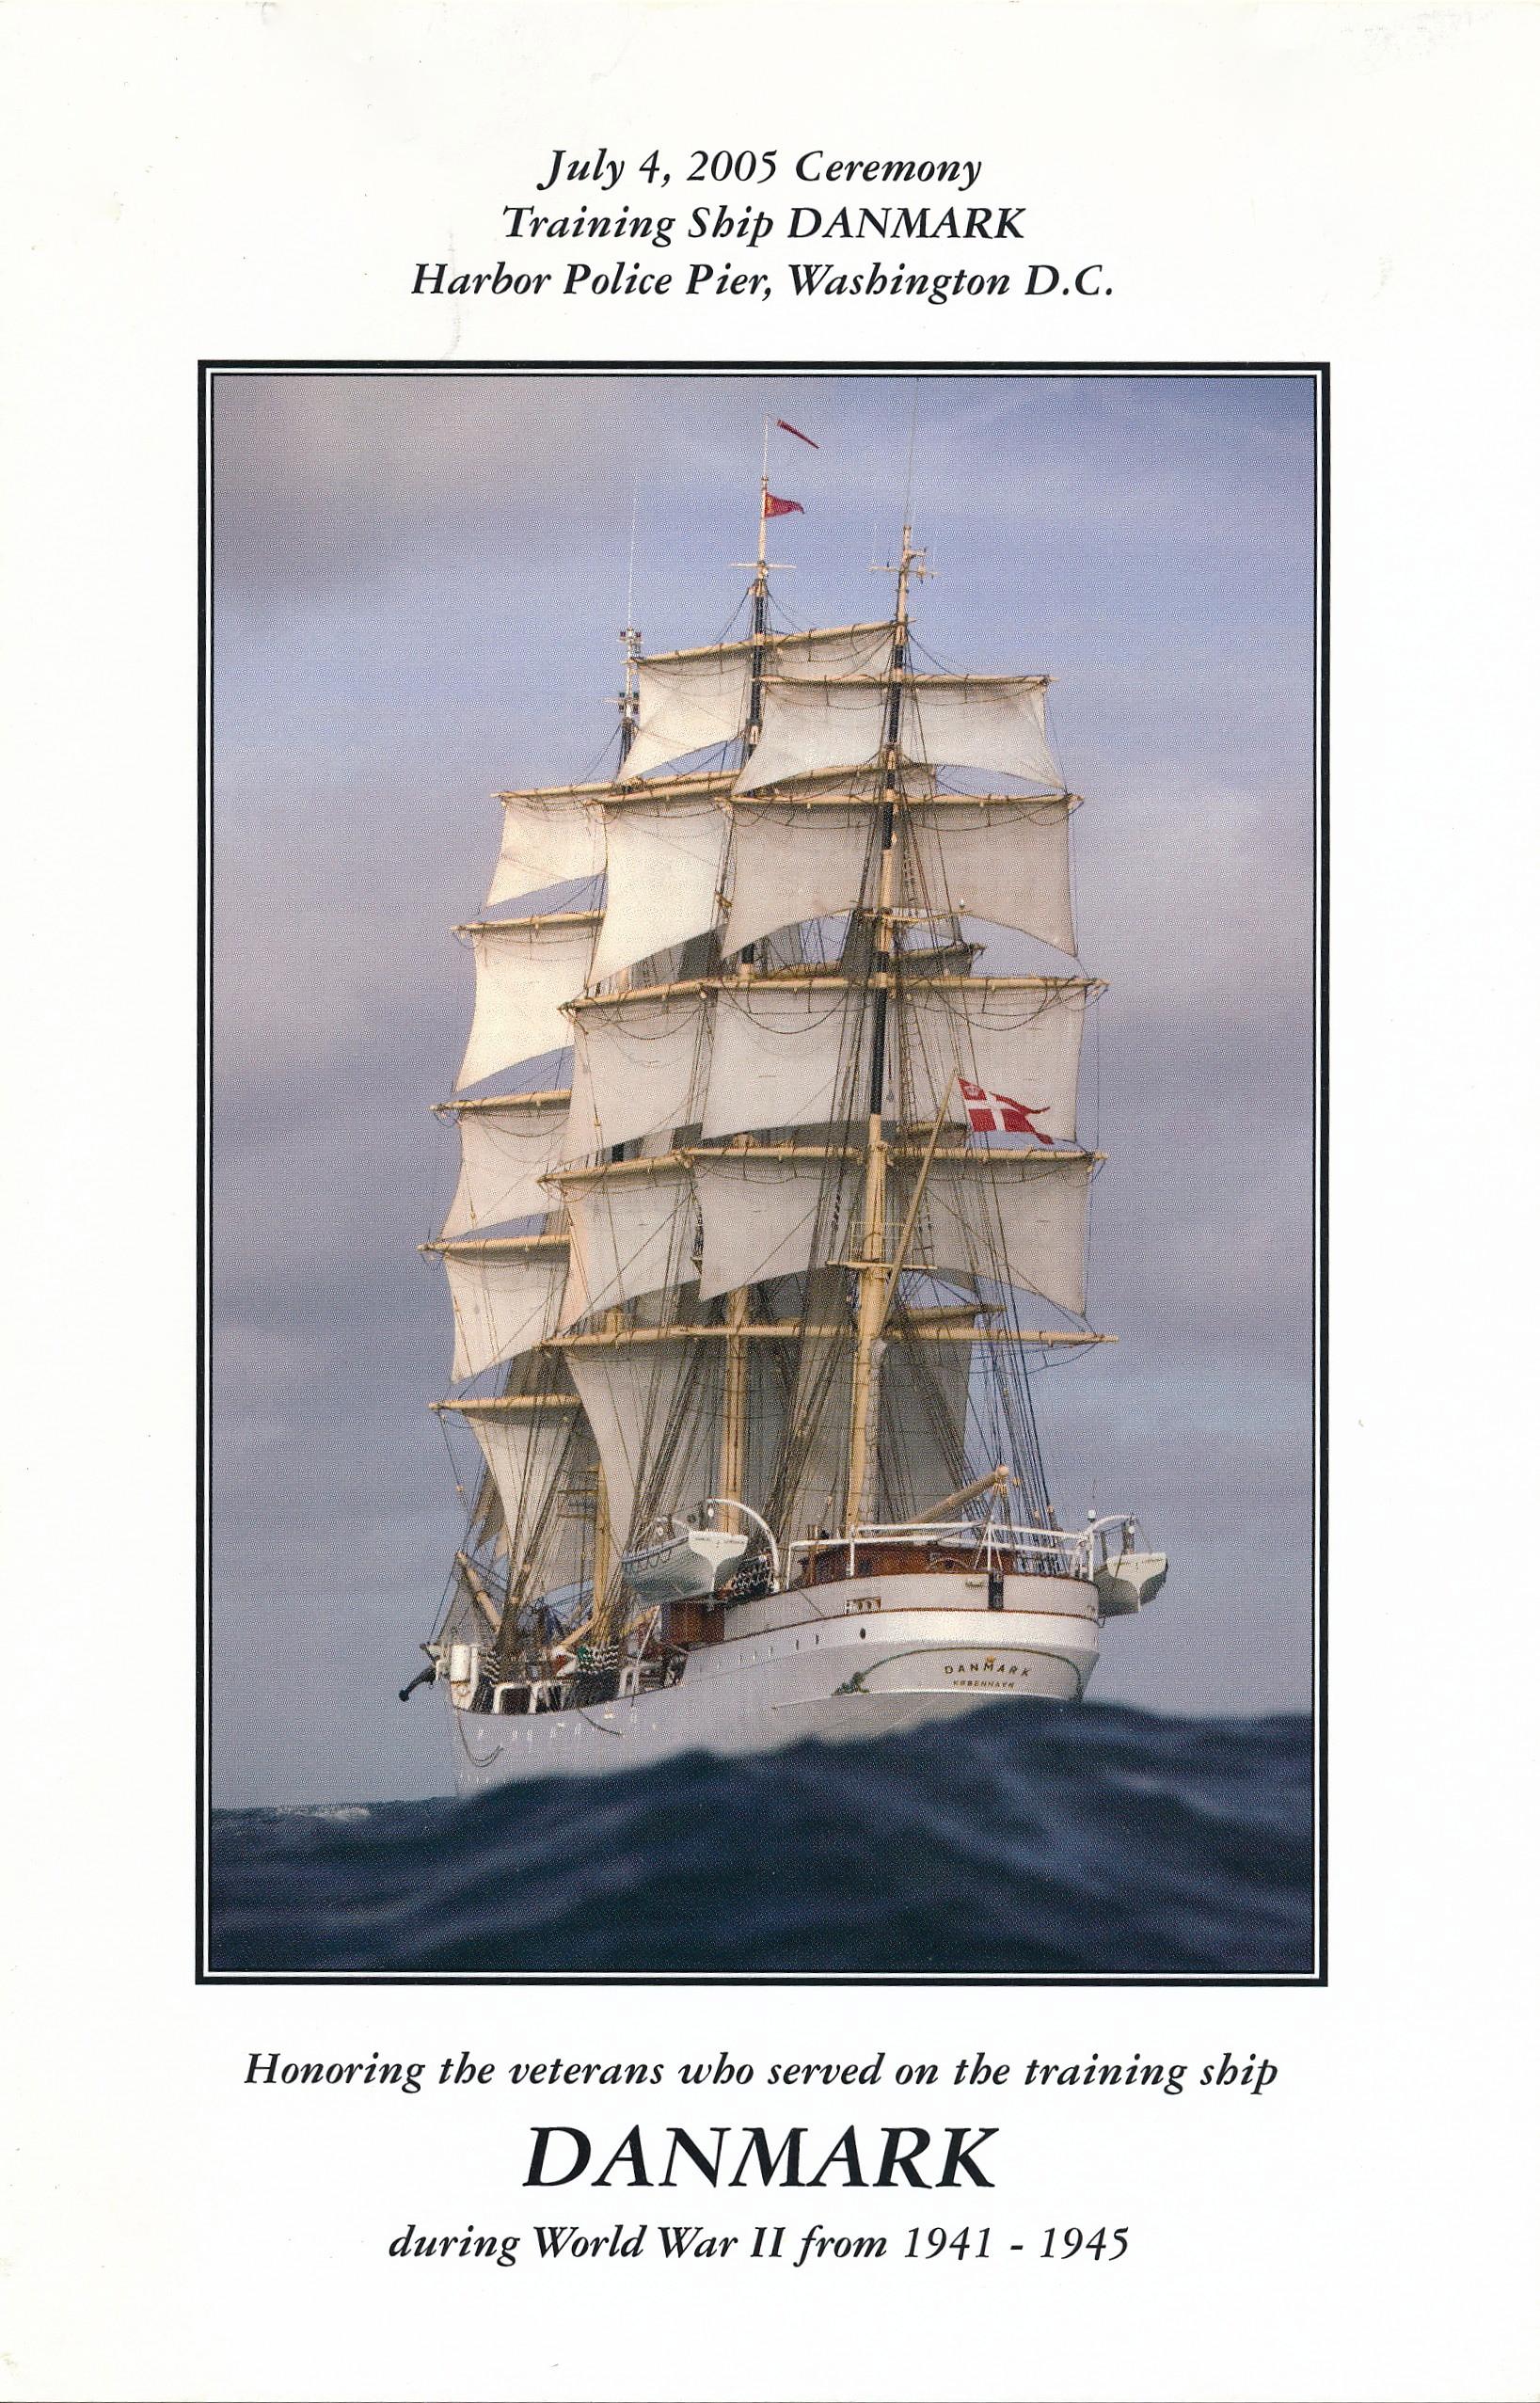 Art  on Canvas The Kingdom of Denmark Full-Rigged Three Masted Ship DANMARK